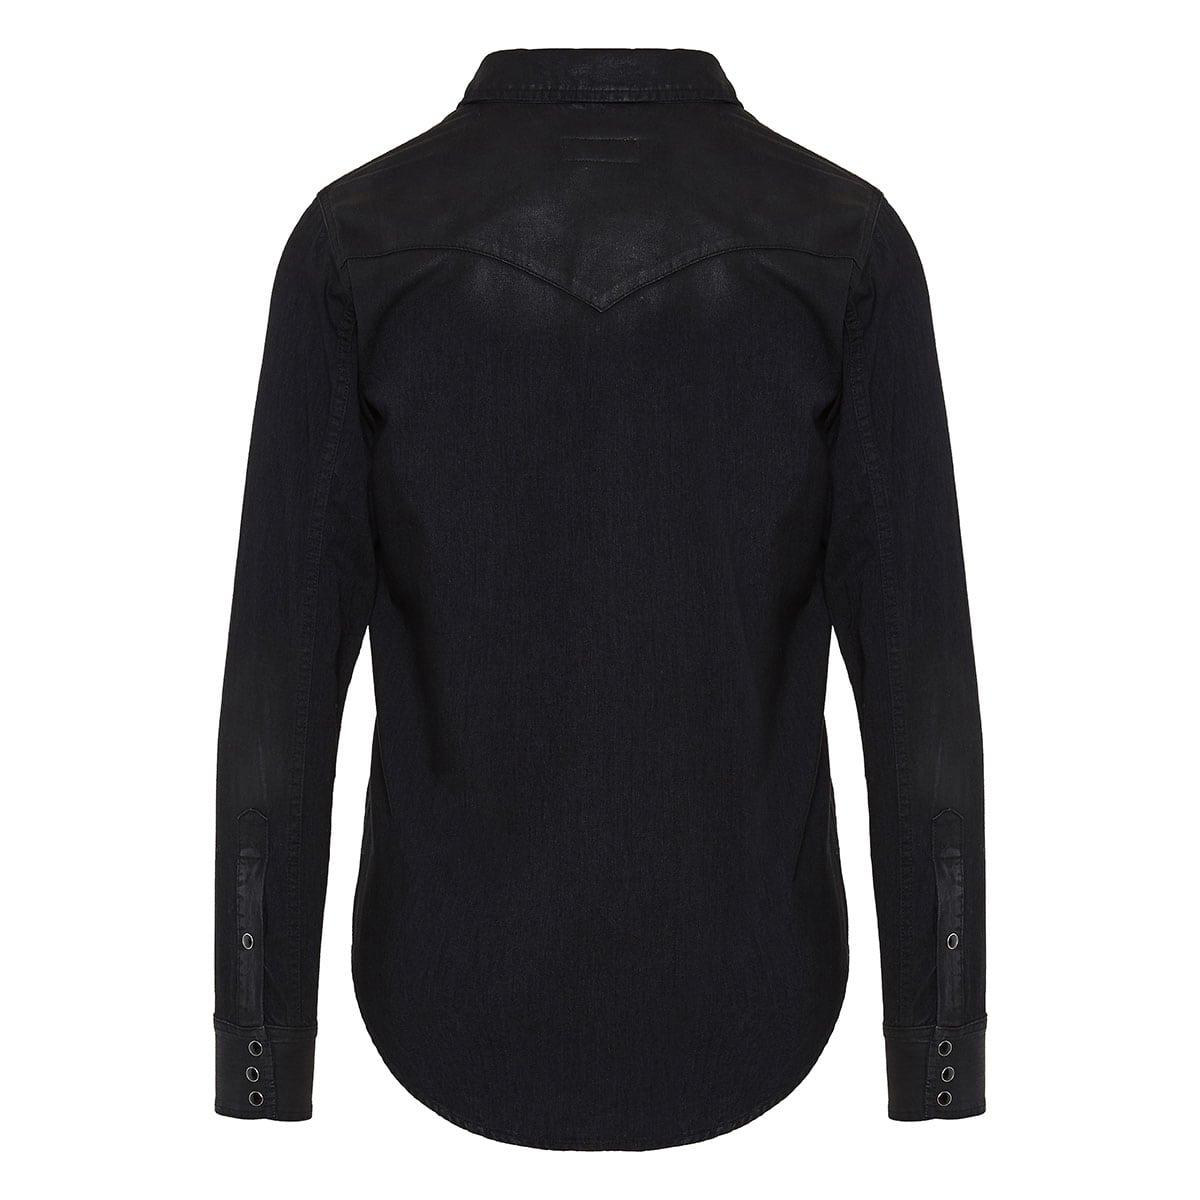 Western coated-denim shirt